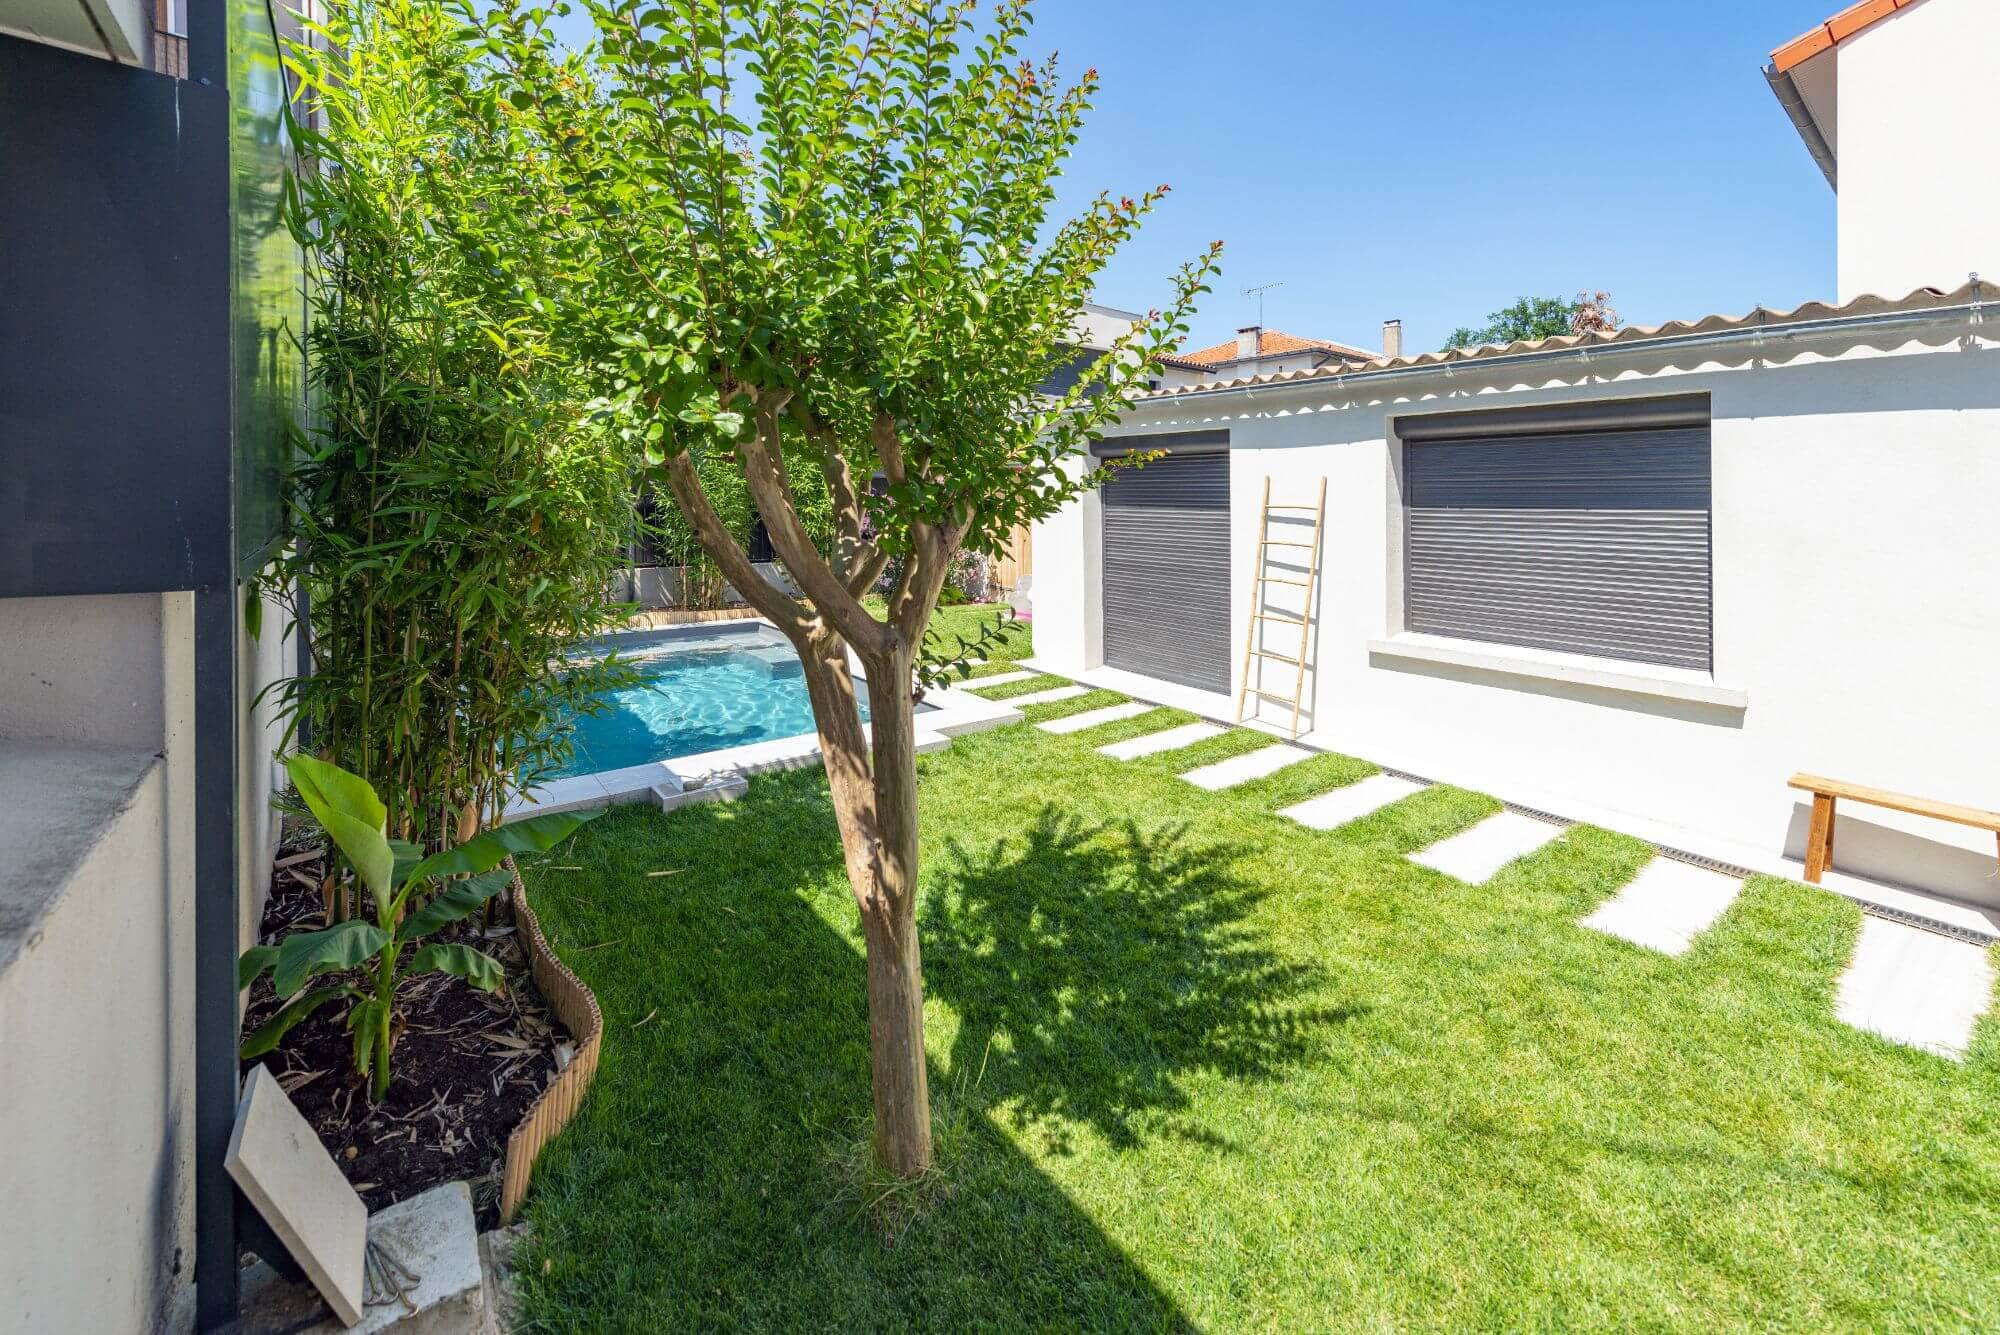 Jardin, Piscine, herbe, pelouse